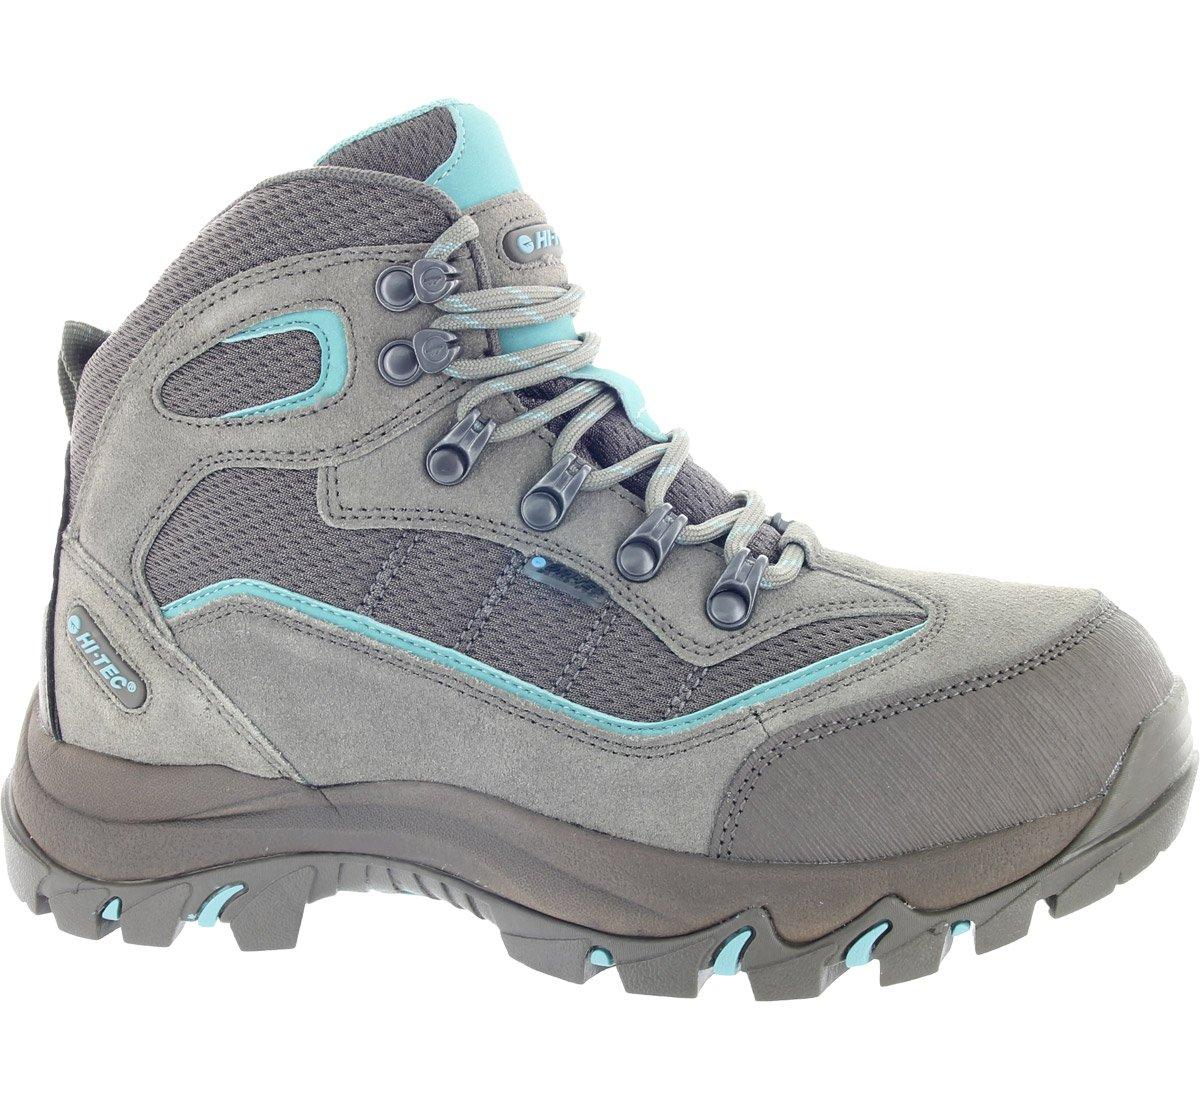 Hi-Tec Women's Skamania Hiking Boots Waterproof, Taupe/Smokey Brown/Mint, 7 B(M) US by Hi-Tec